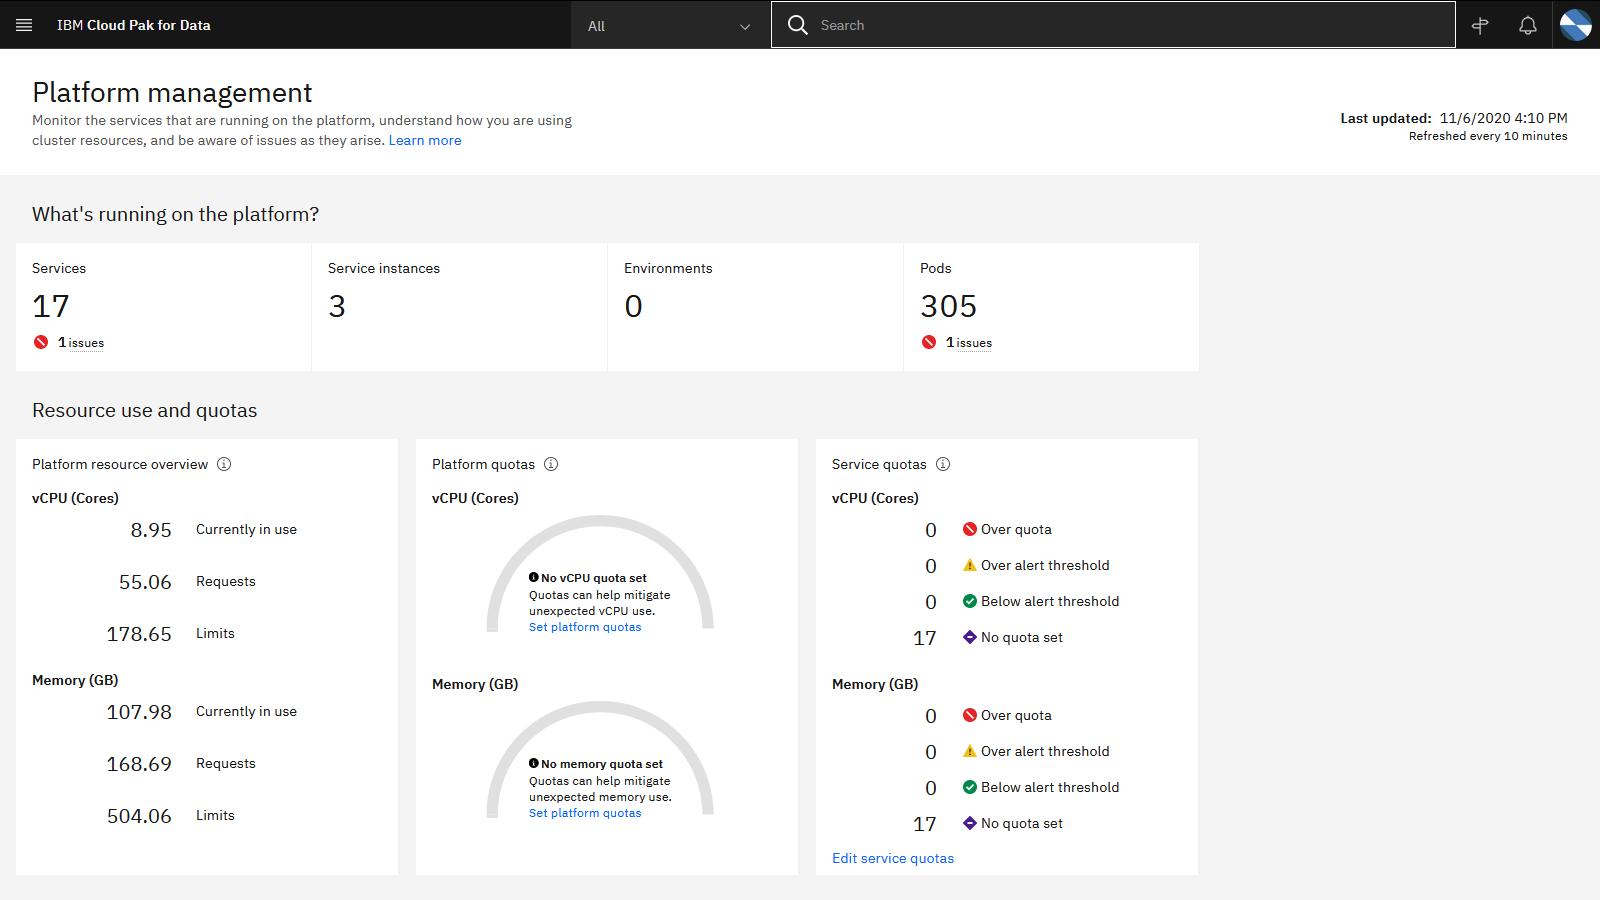 The Platform management page